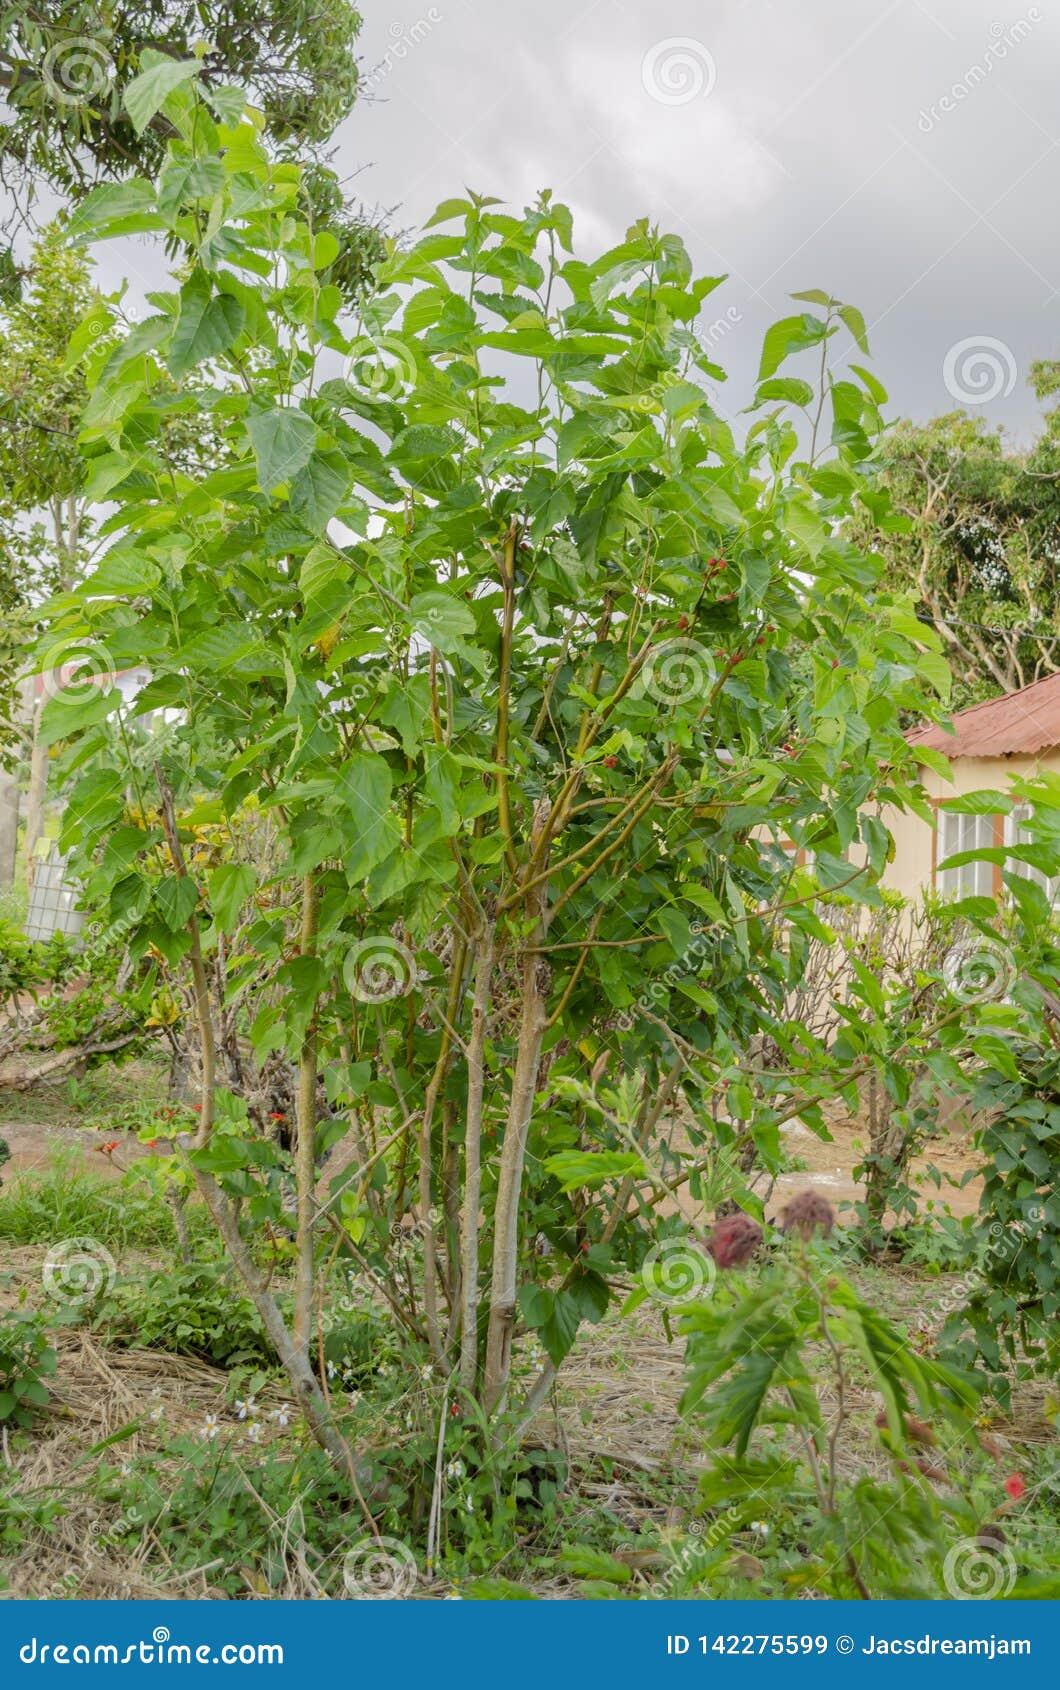 Fruiting Mulberry Tree Stock Image Image Of Many Moreae 142275599